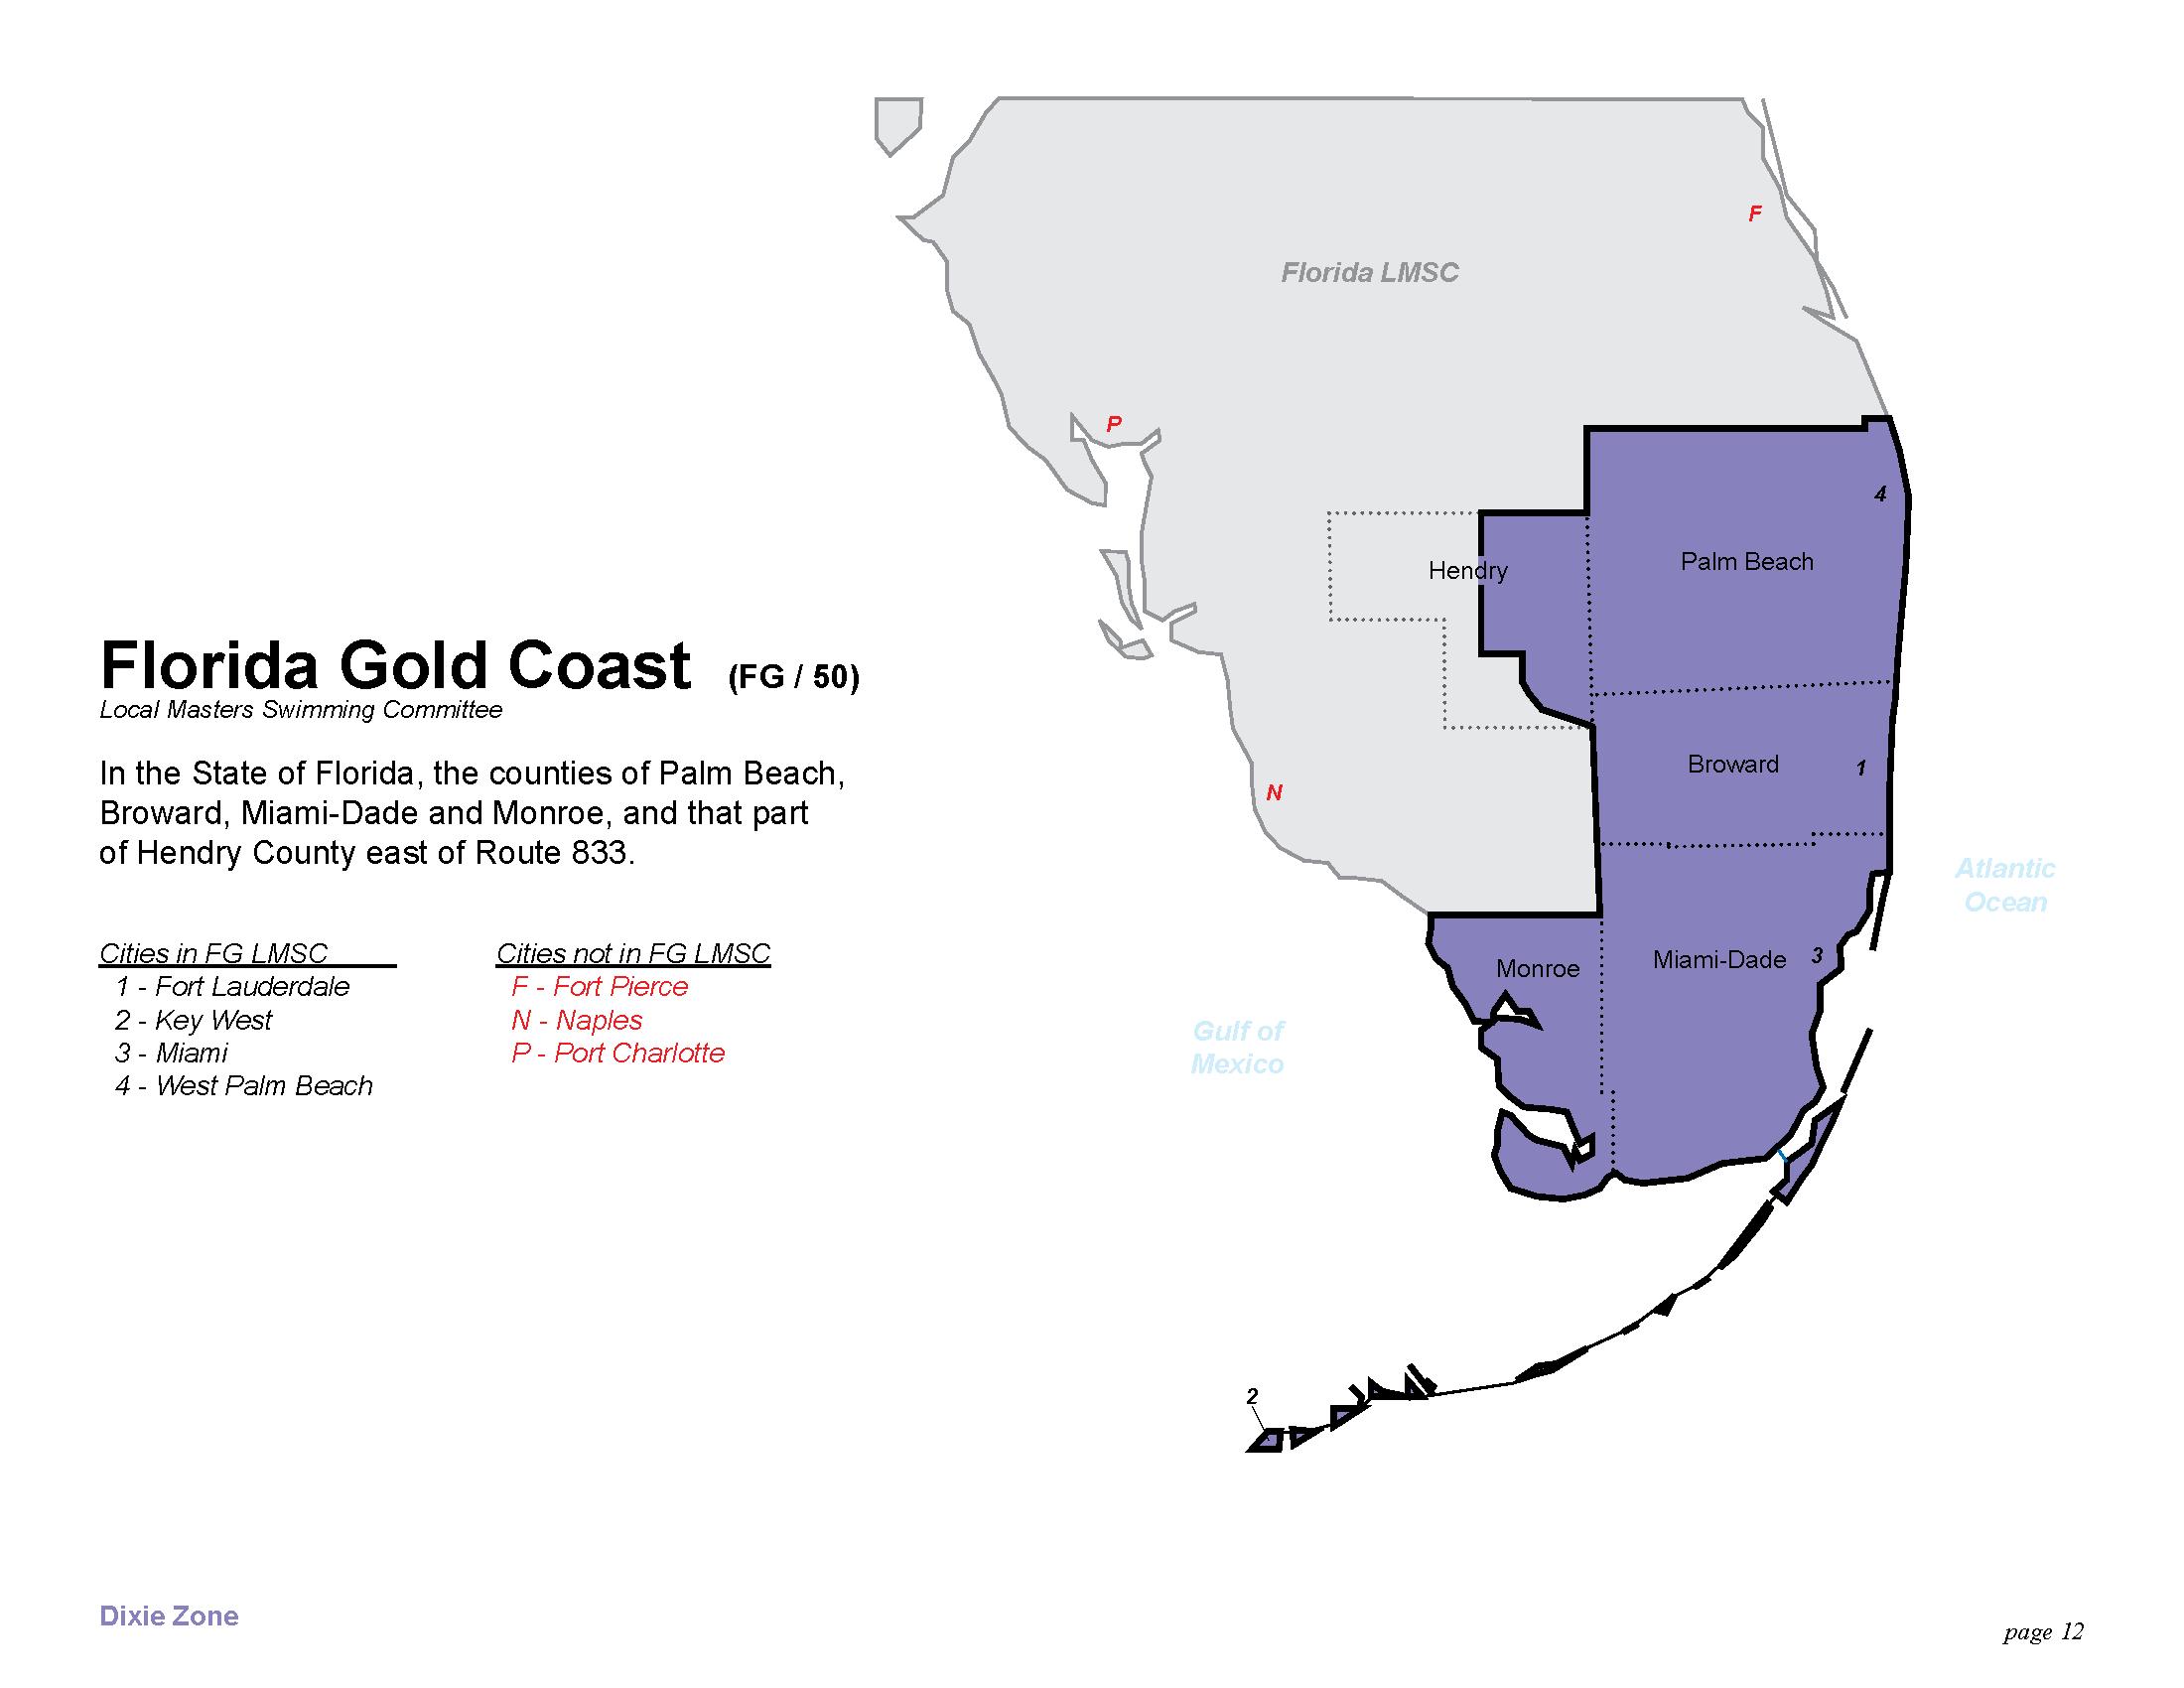 Palm Beach Florida Map West Palm Beach Florida City Map West Palm - Us West Coast Map With Cities